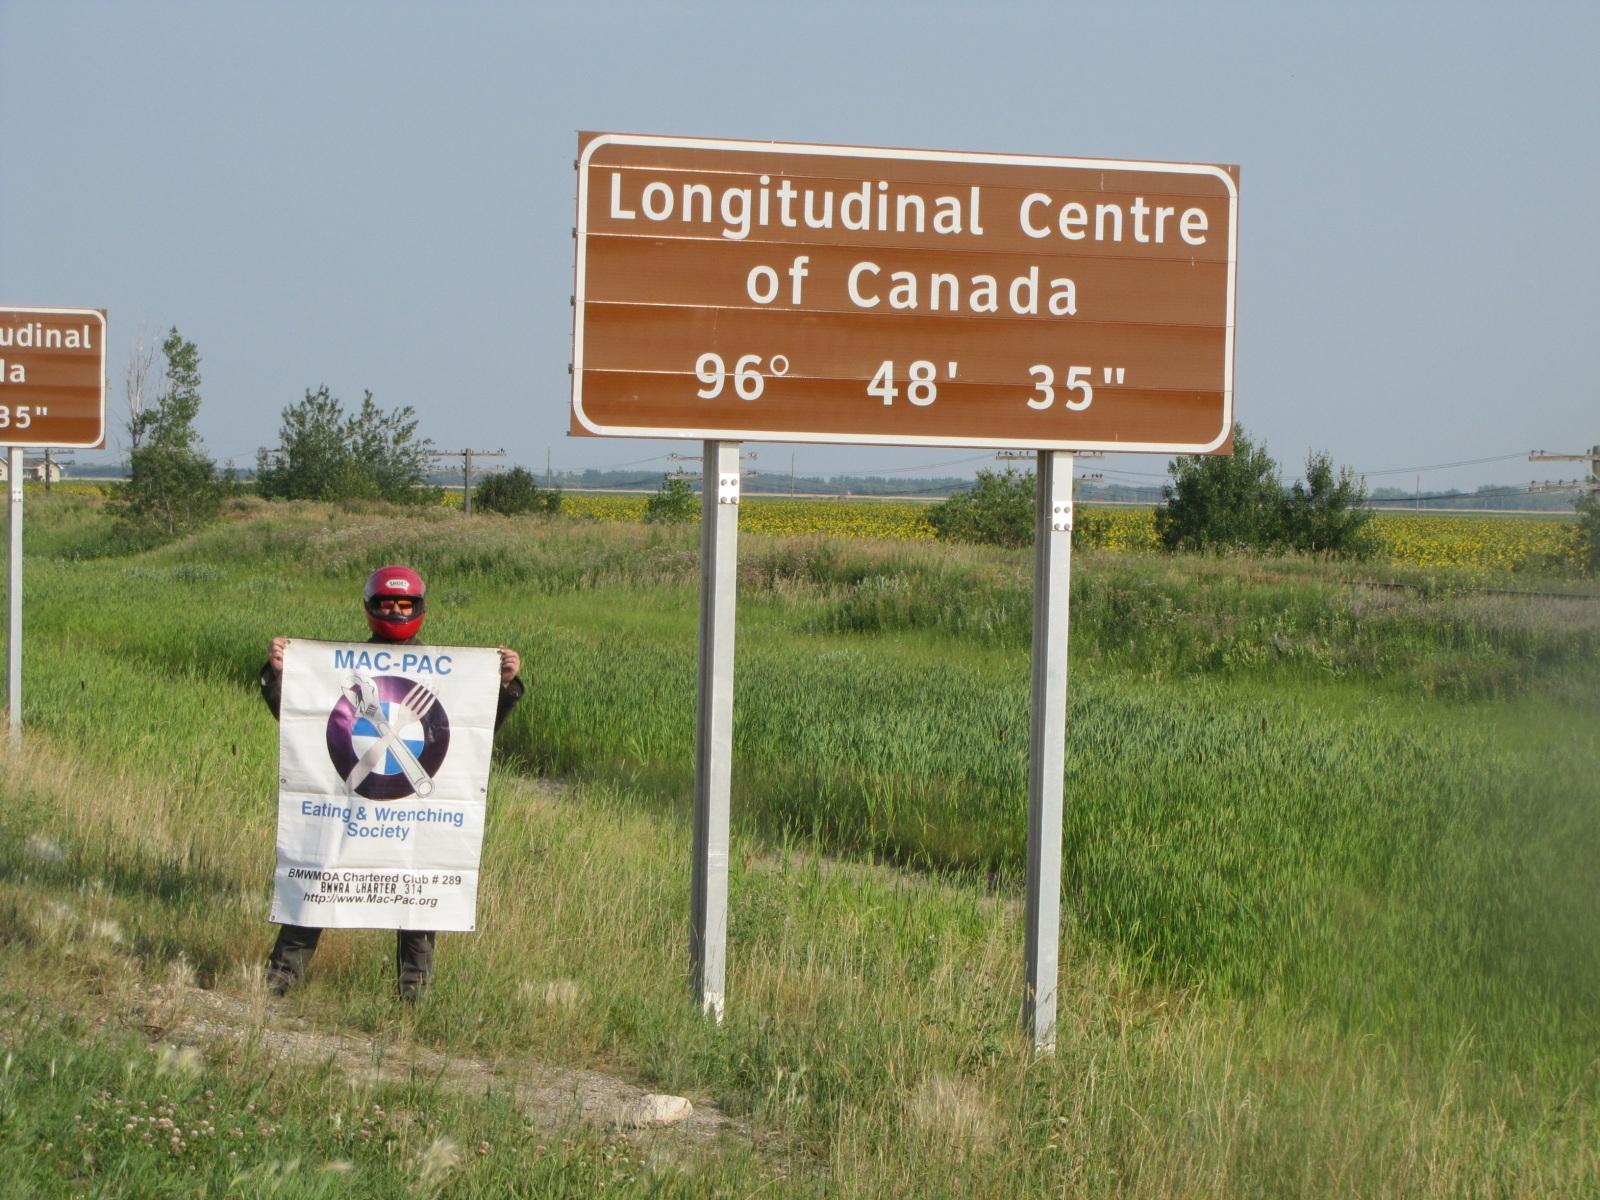 Longitudinal Centre of Canada